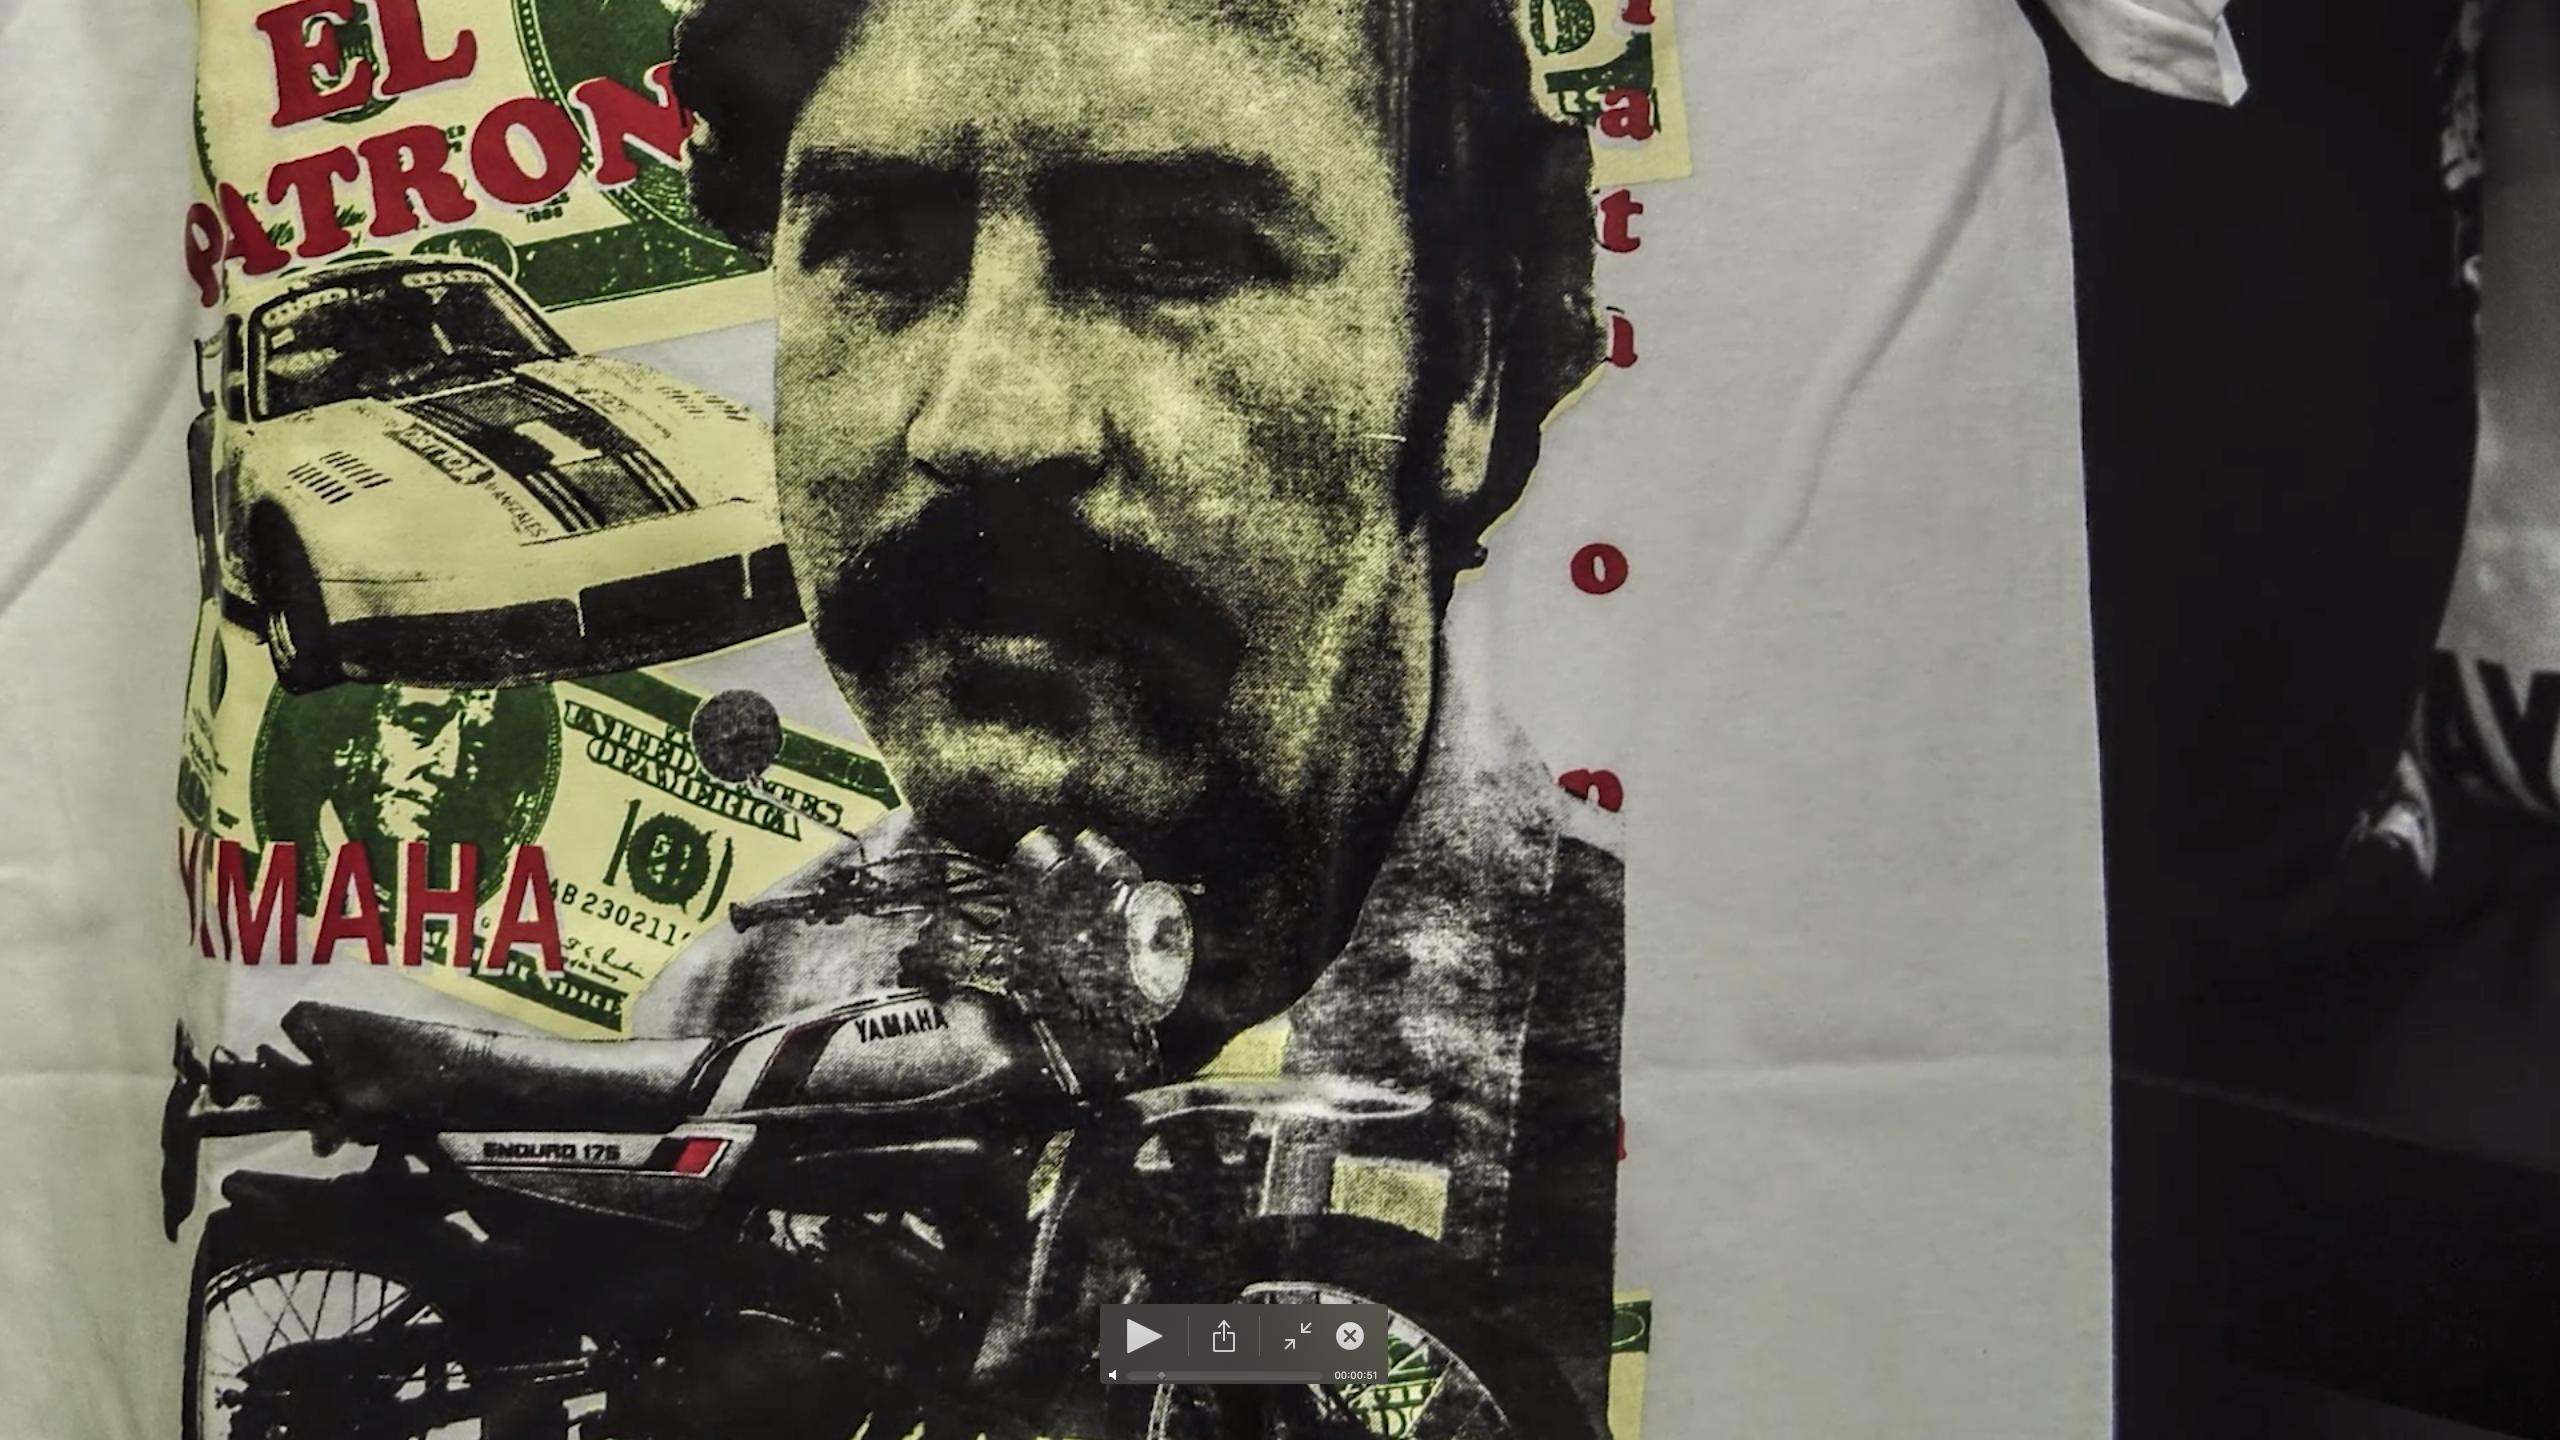 Pablo Escobar Narcolombia